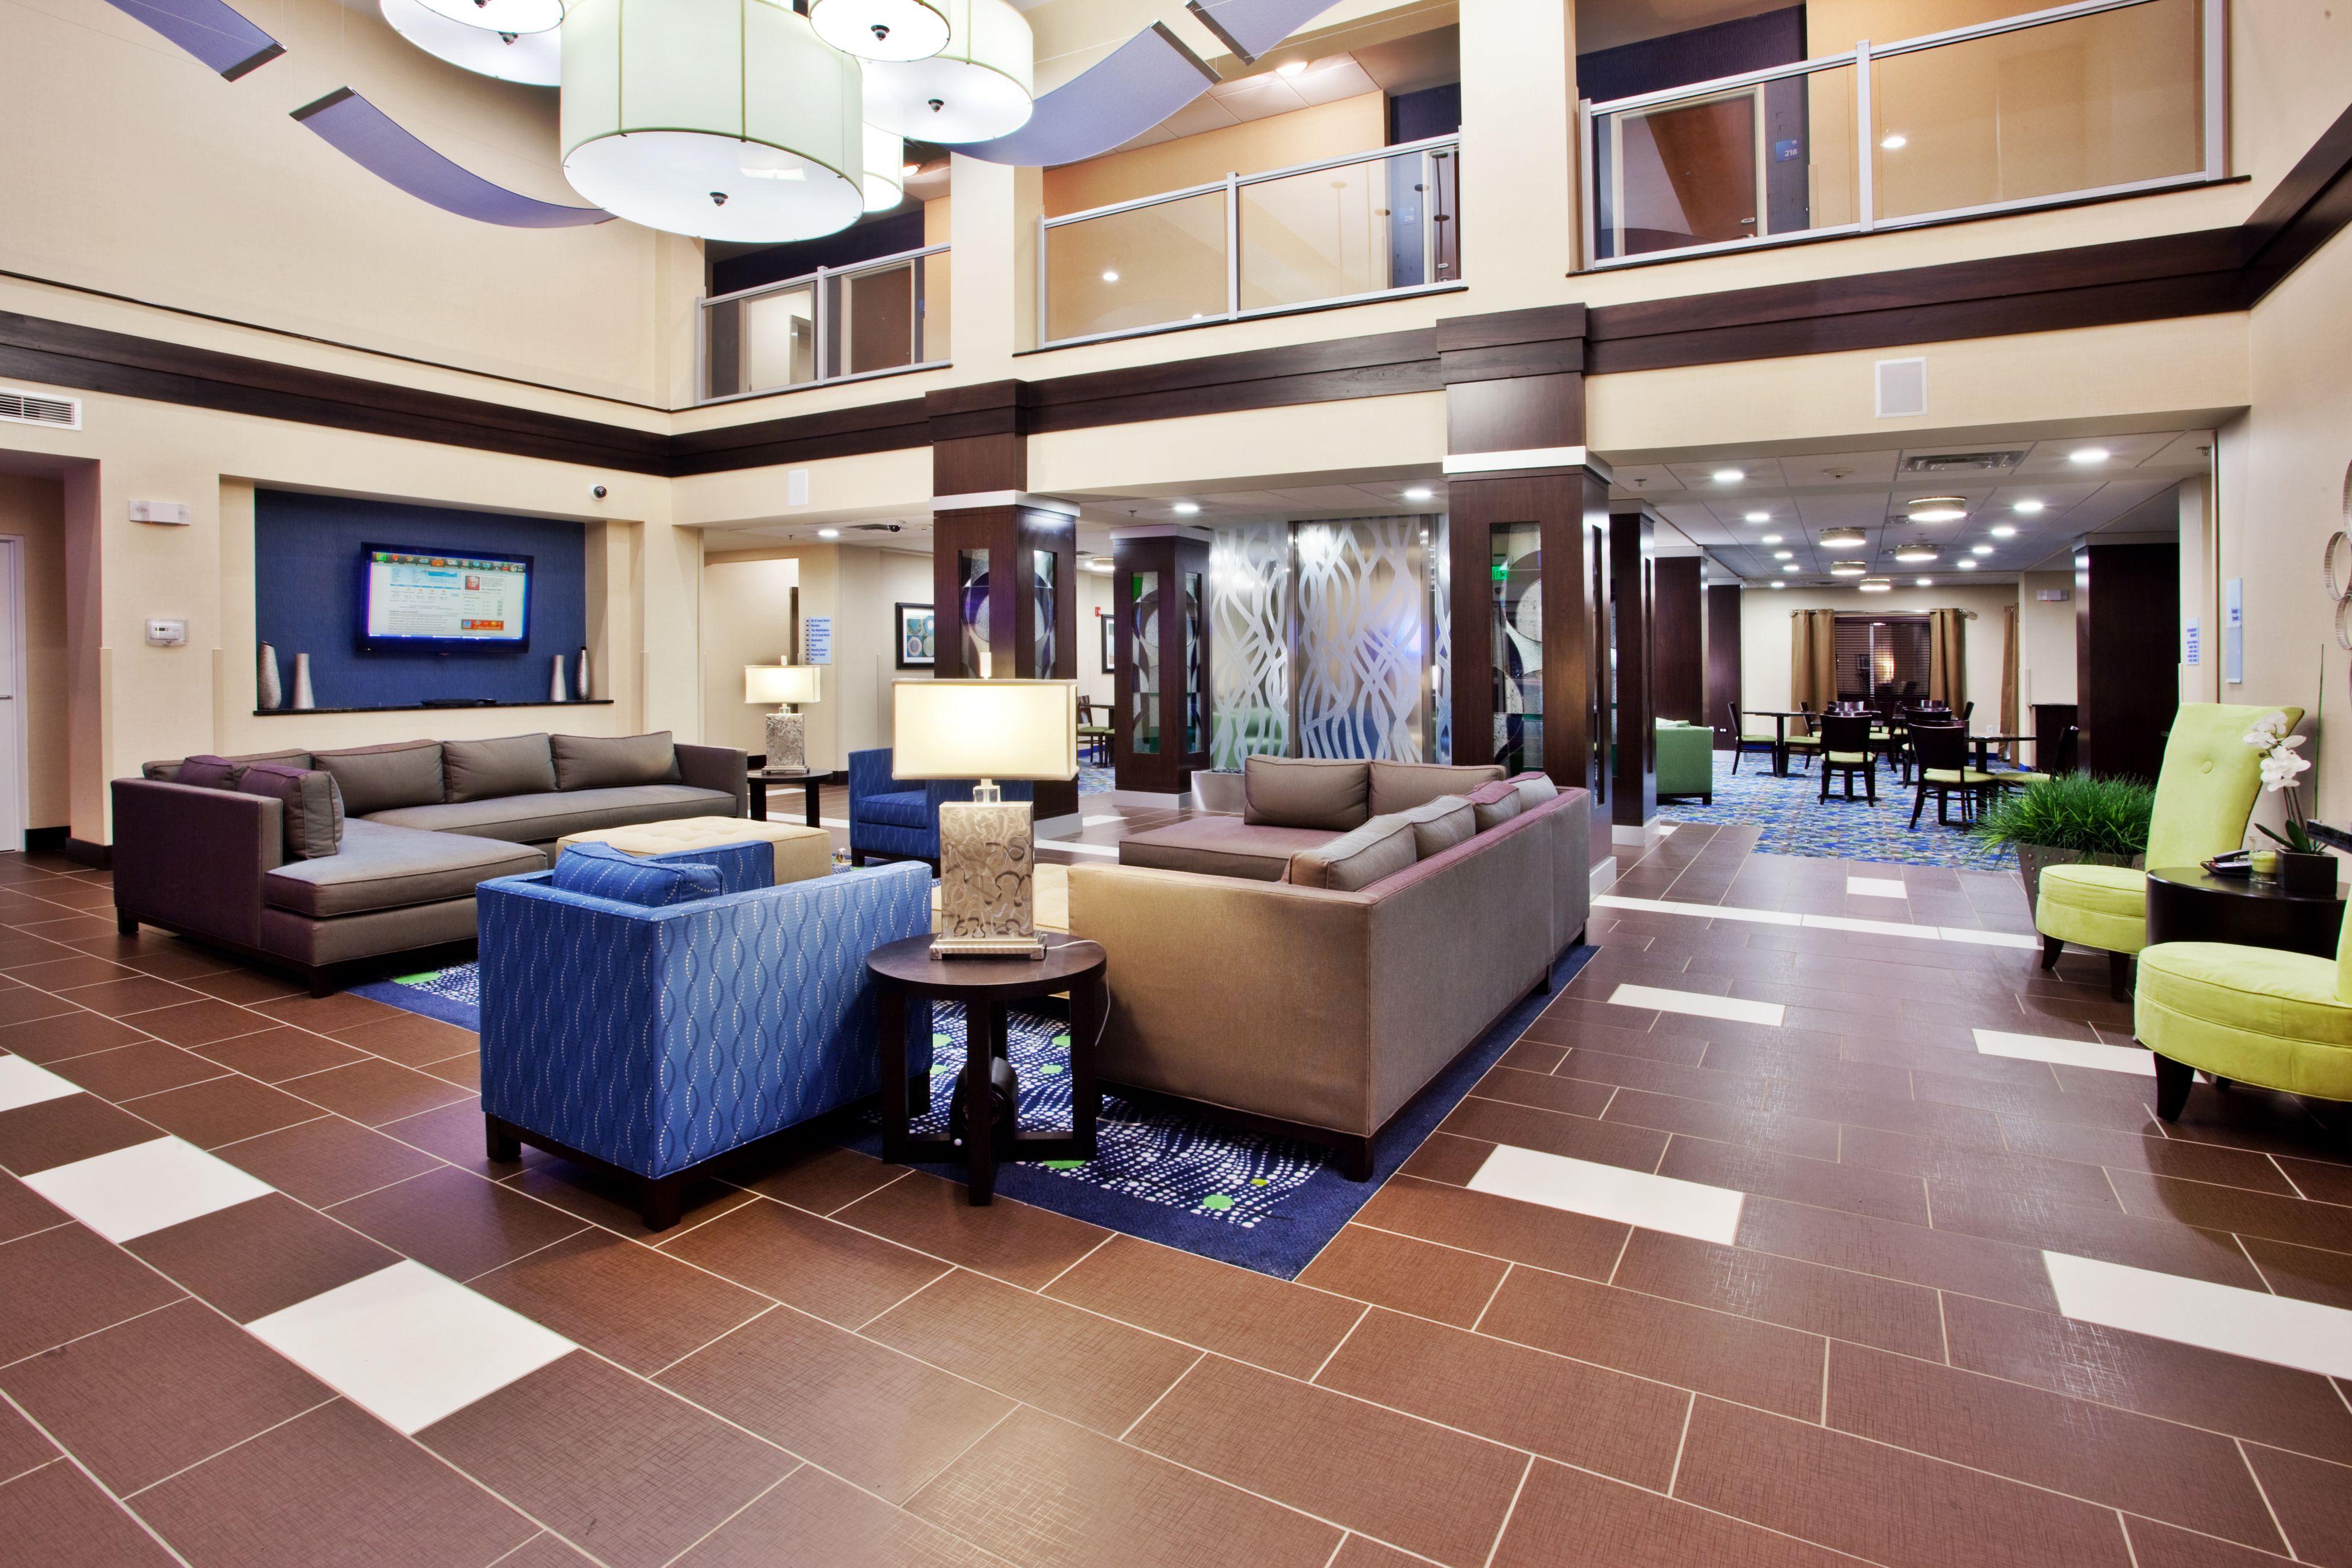 Holiday Inn Express & Suites Atlanta Arpt West - Camp Creek image 8